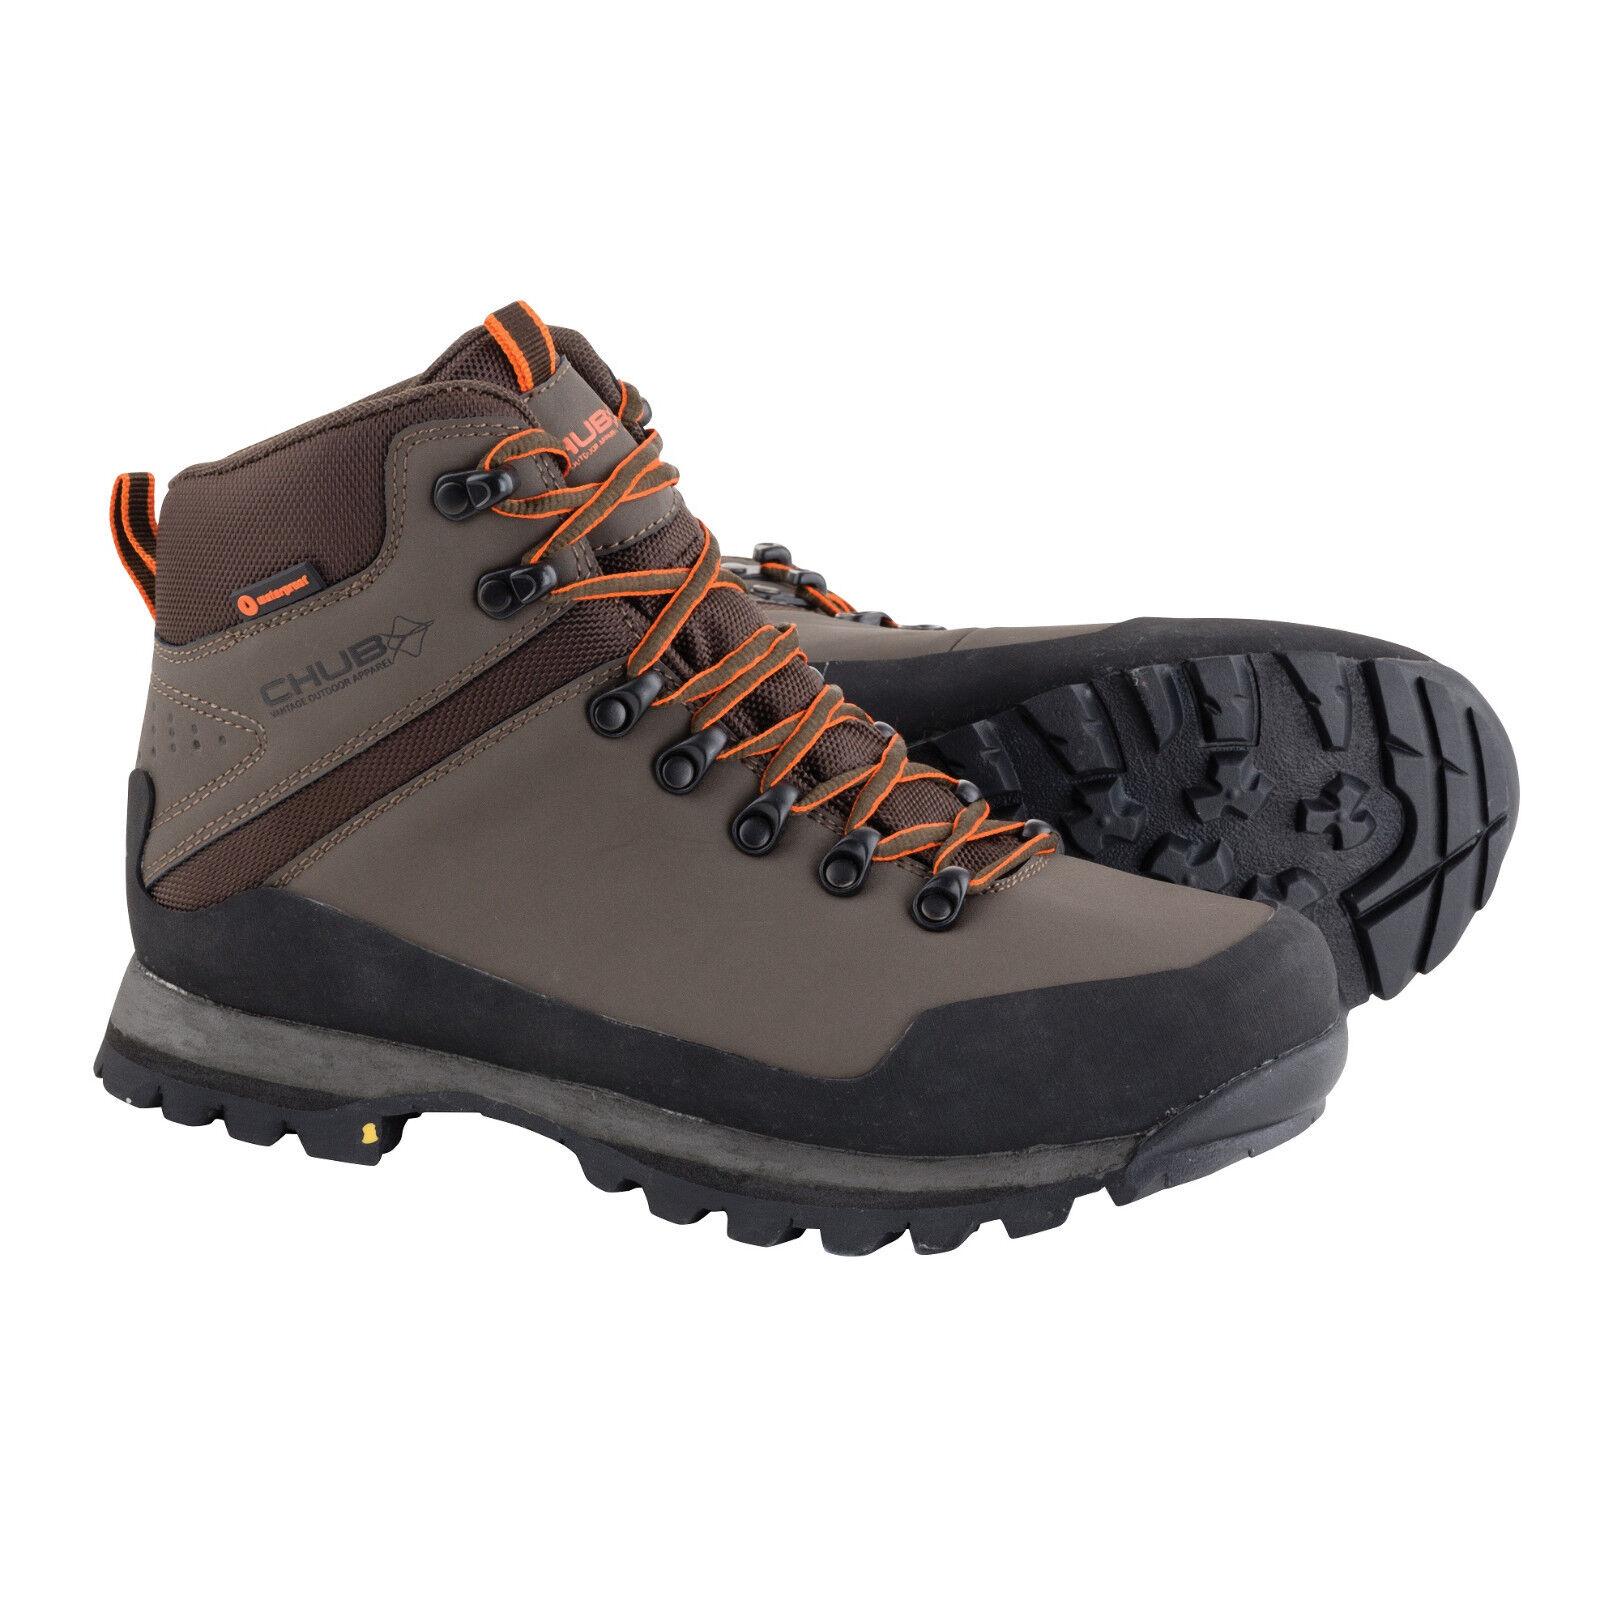 Chub Vantage Field Stiefel Schuhe Angelschuhe Stiefel Outdoorschuhe